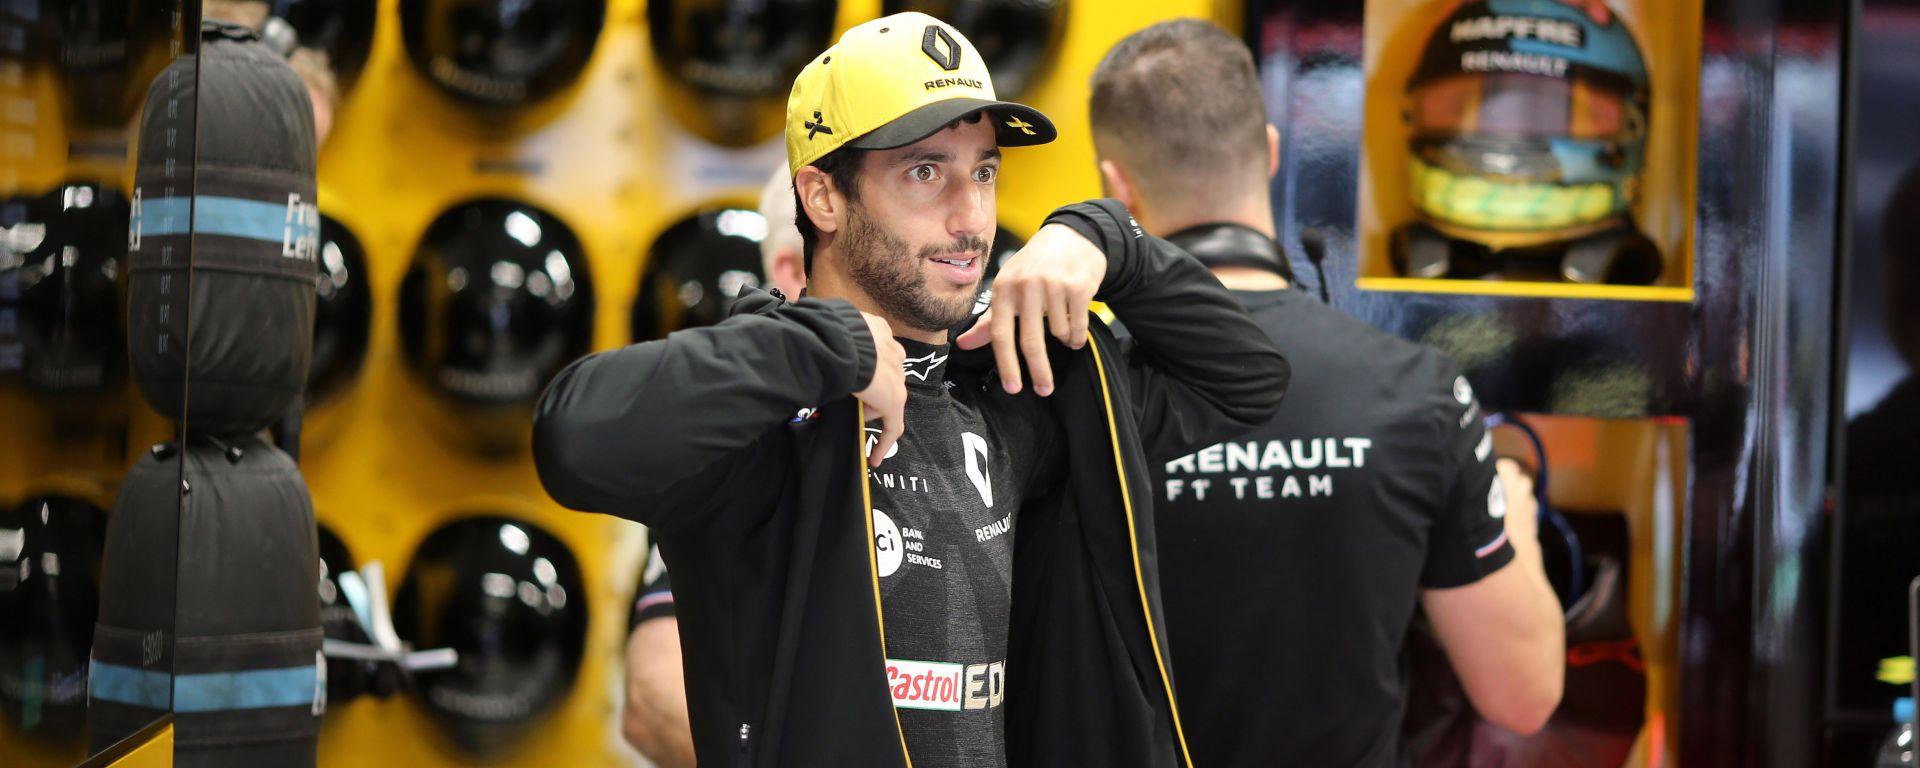 F1 GP Brasile 2019, Interlagos: Daniel Ricciardo nel box Renault